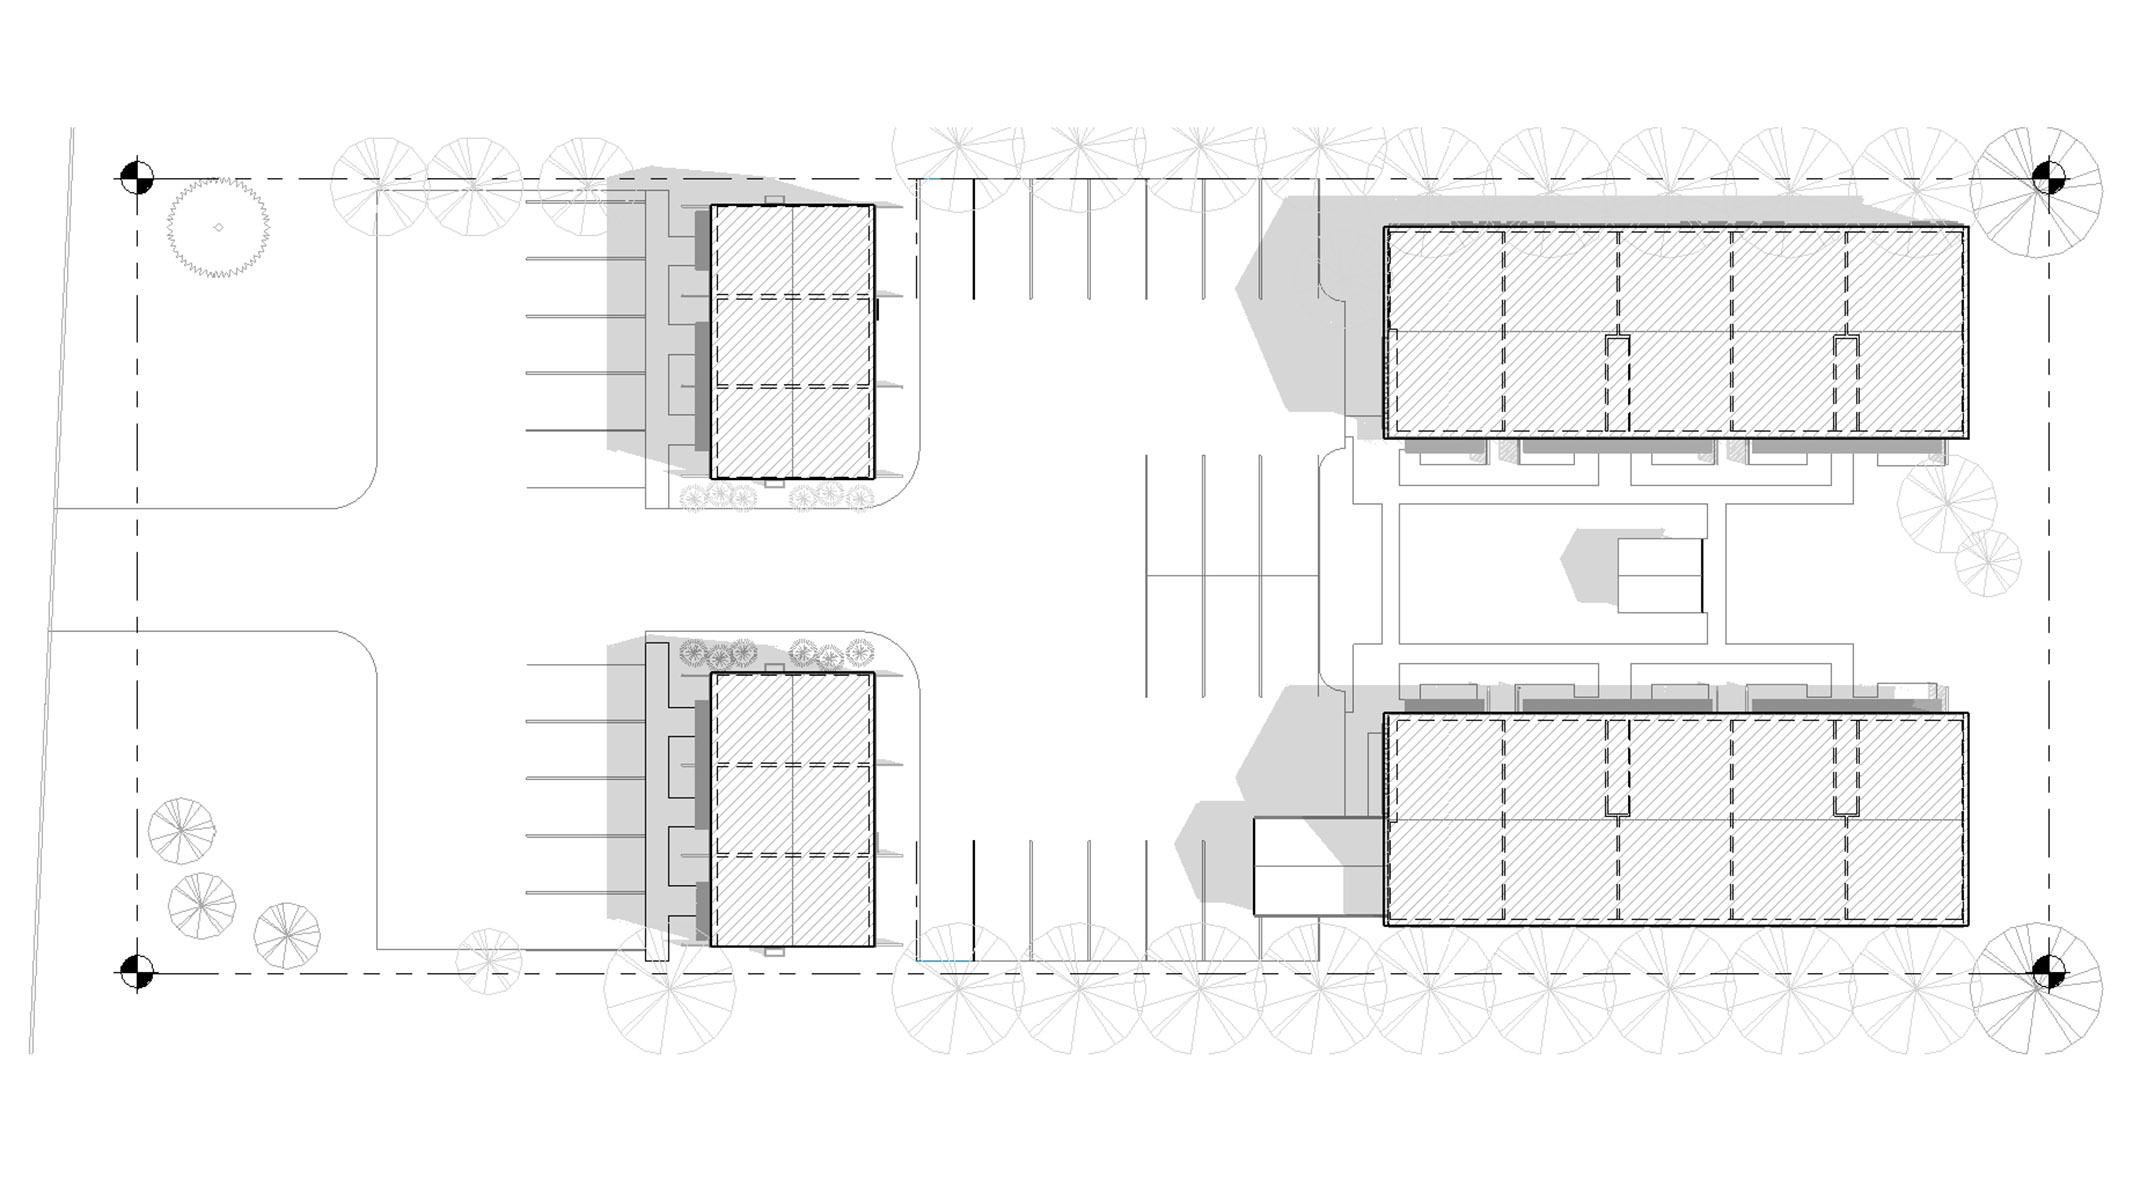 Affordable Housing Exterior & Energy Updates  - Site Plan.jpg